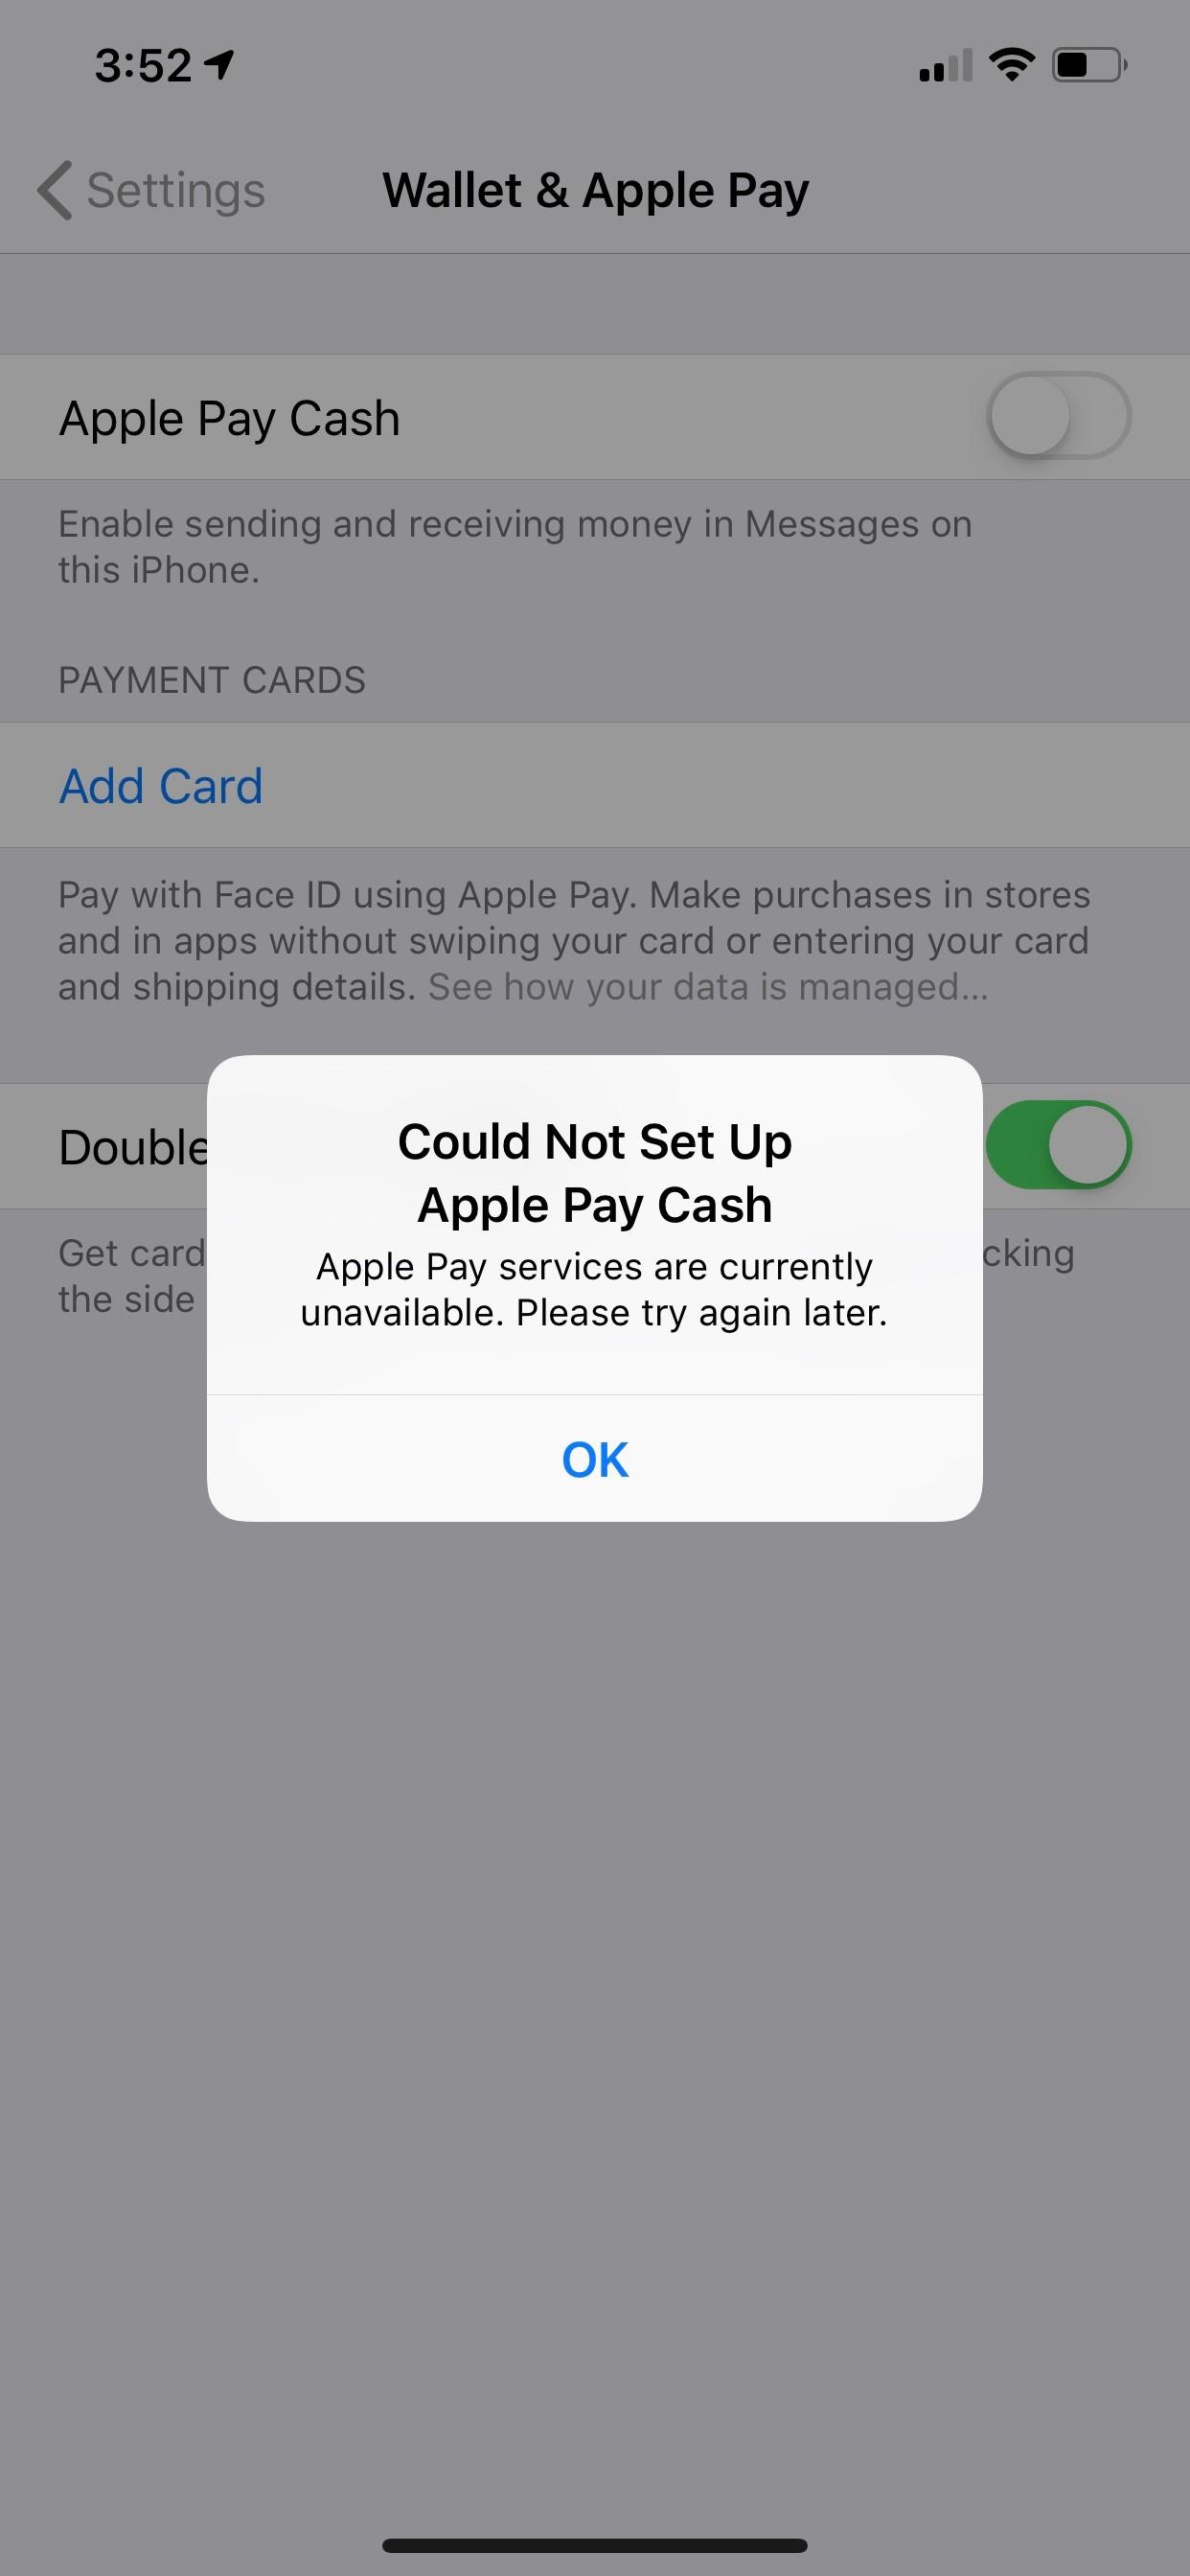 Could Not Set Up Apple Pay Cash ERROR - Apple Community